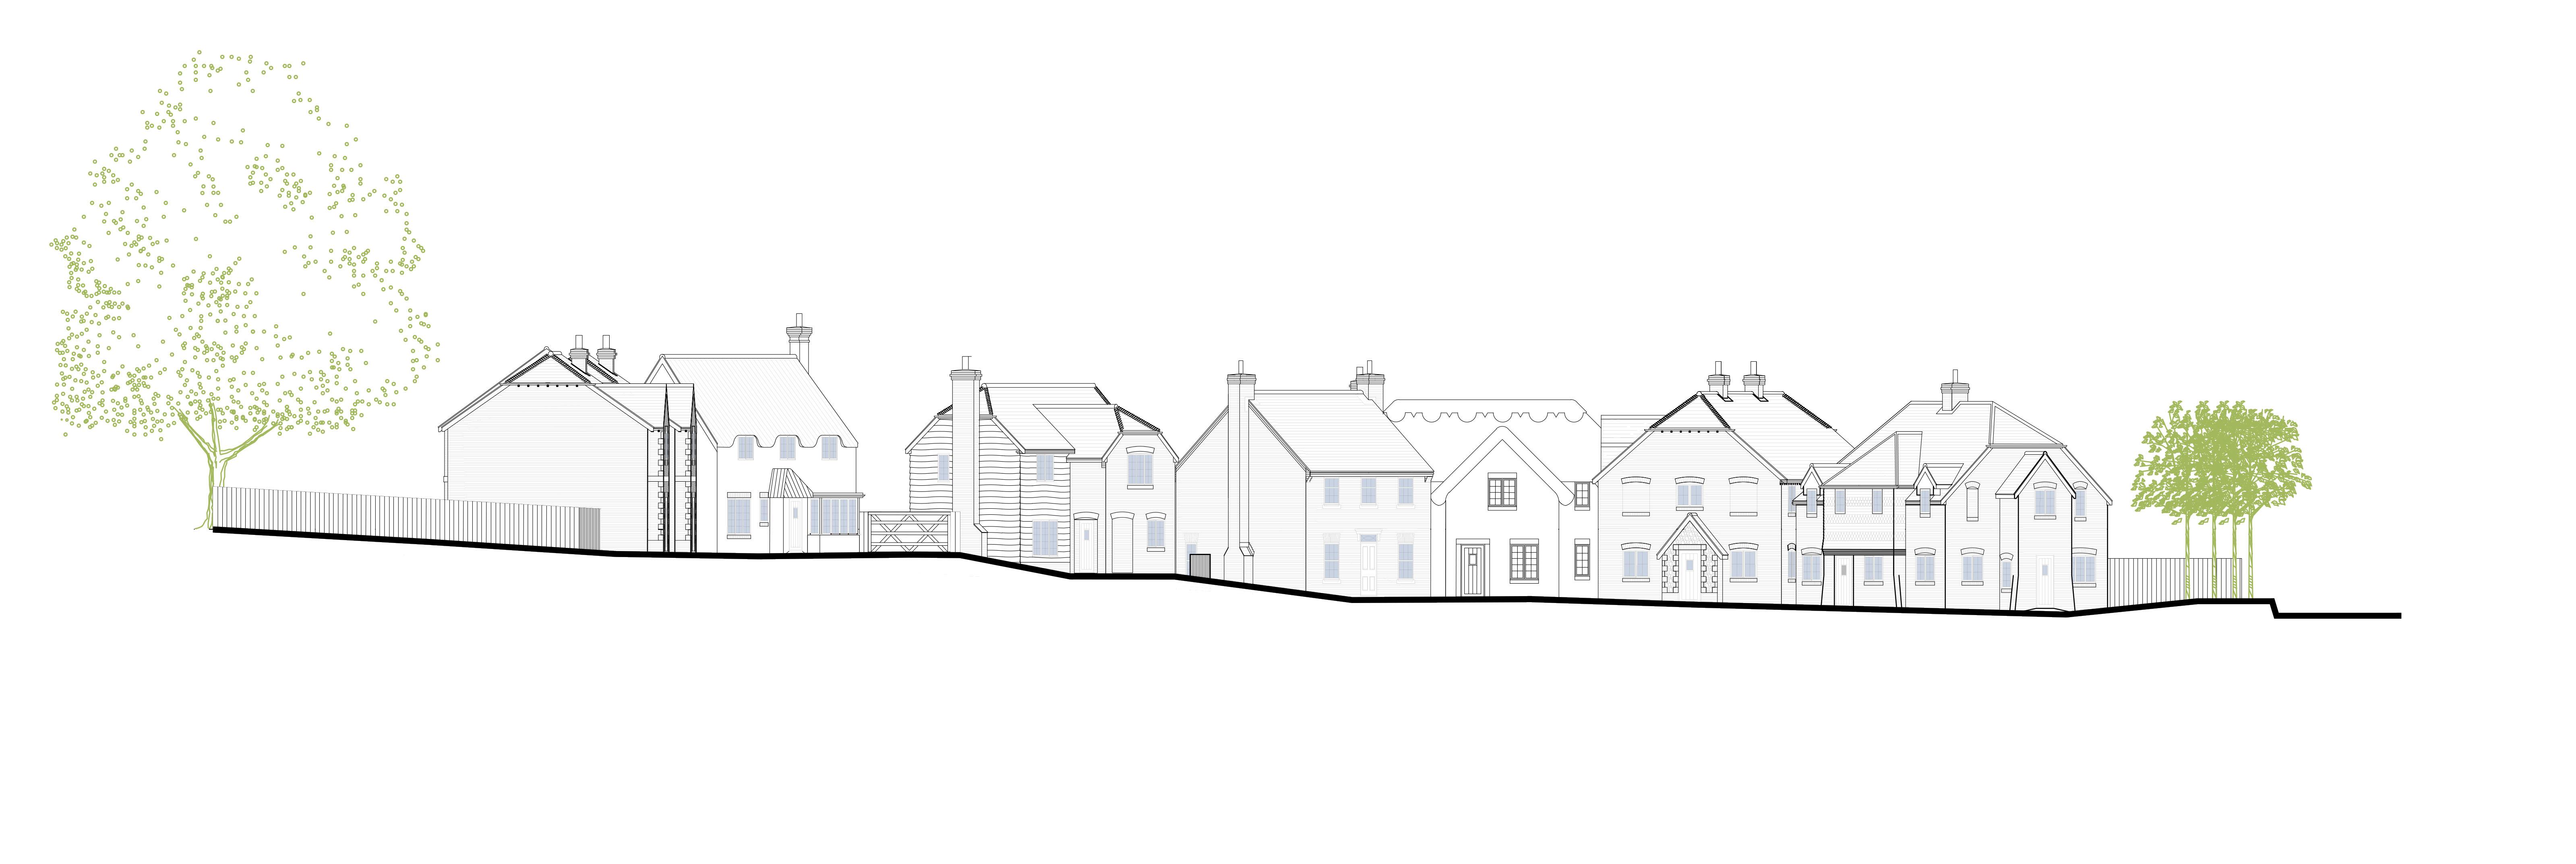 Hurstbourne Priors Elevations